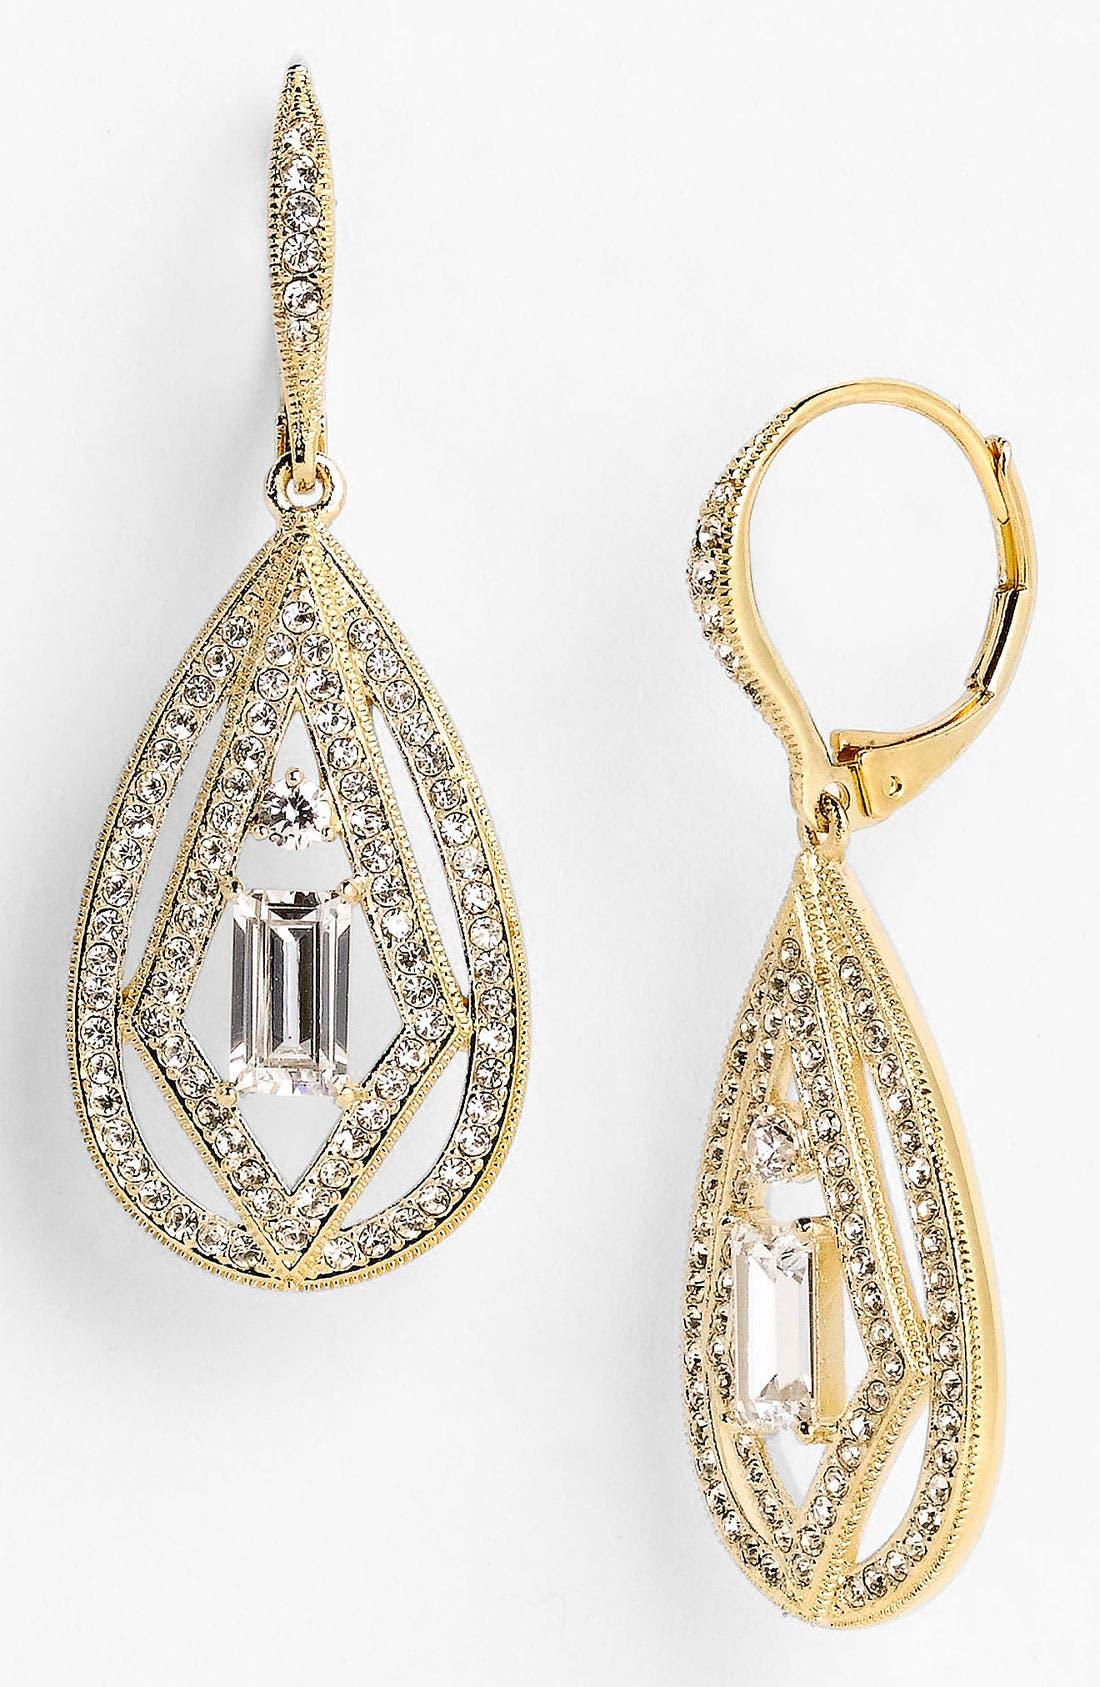 Main Image - Nadri 'Art Deco' Drop Earrings (Nordstrom Exclusive)